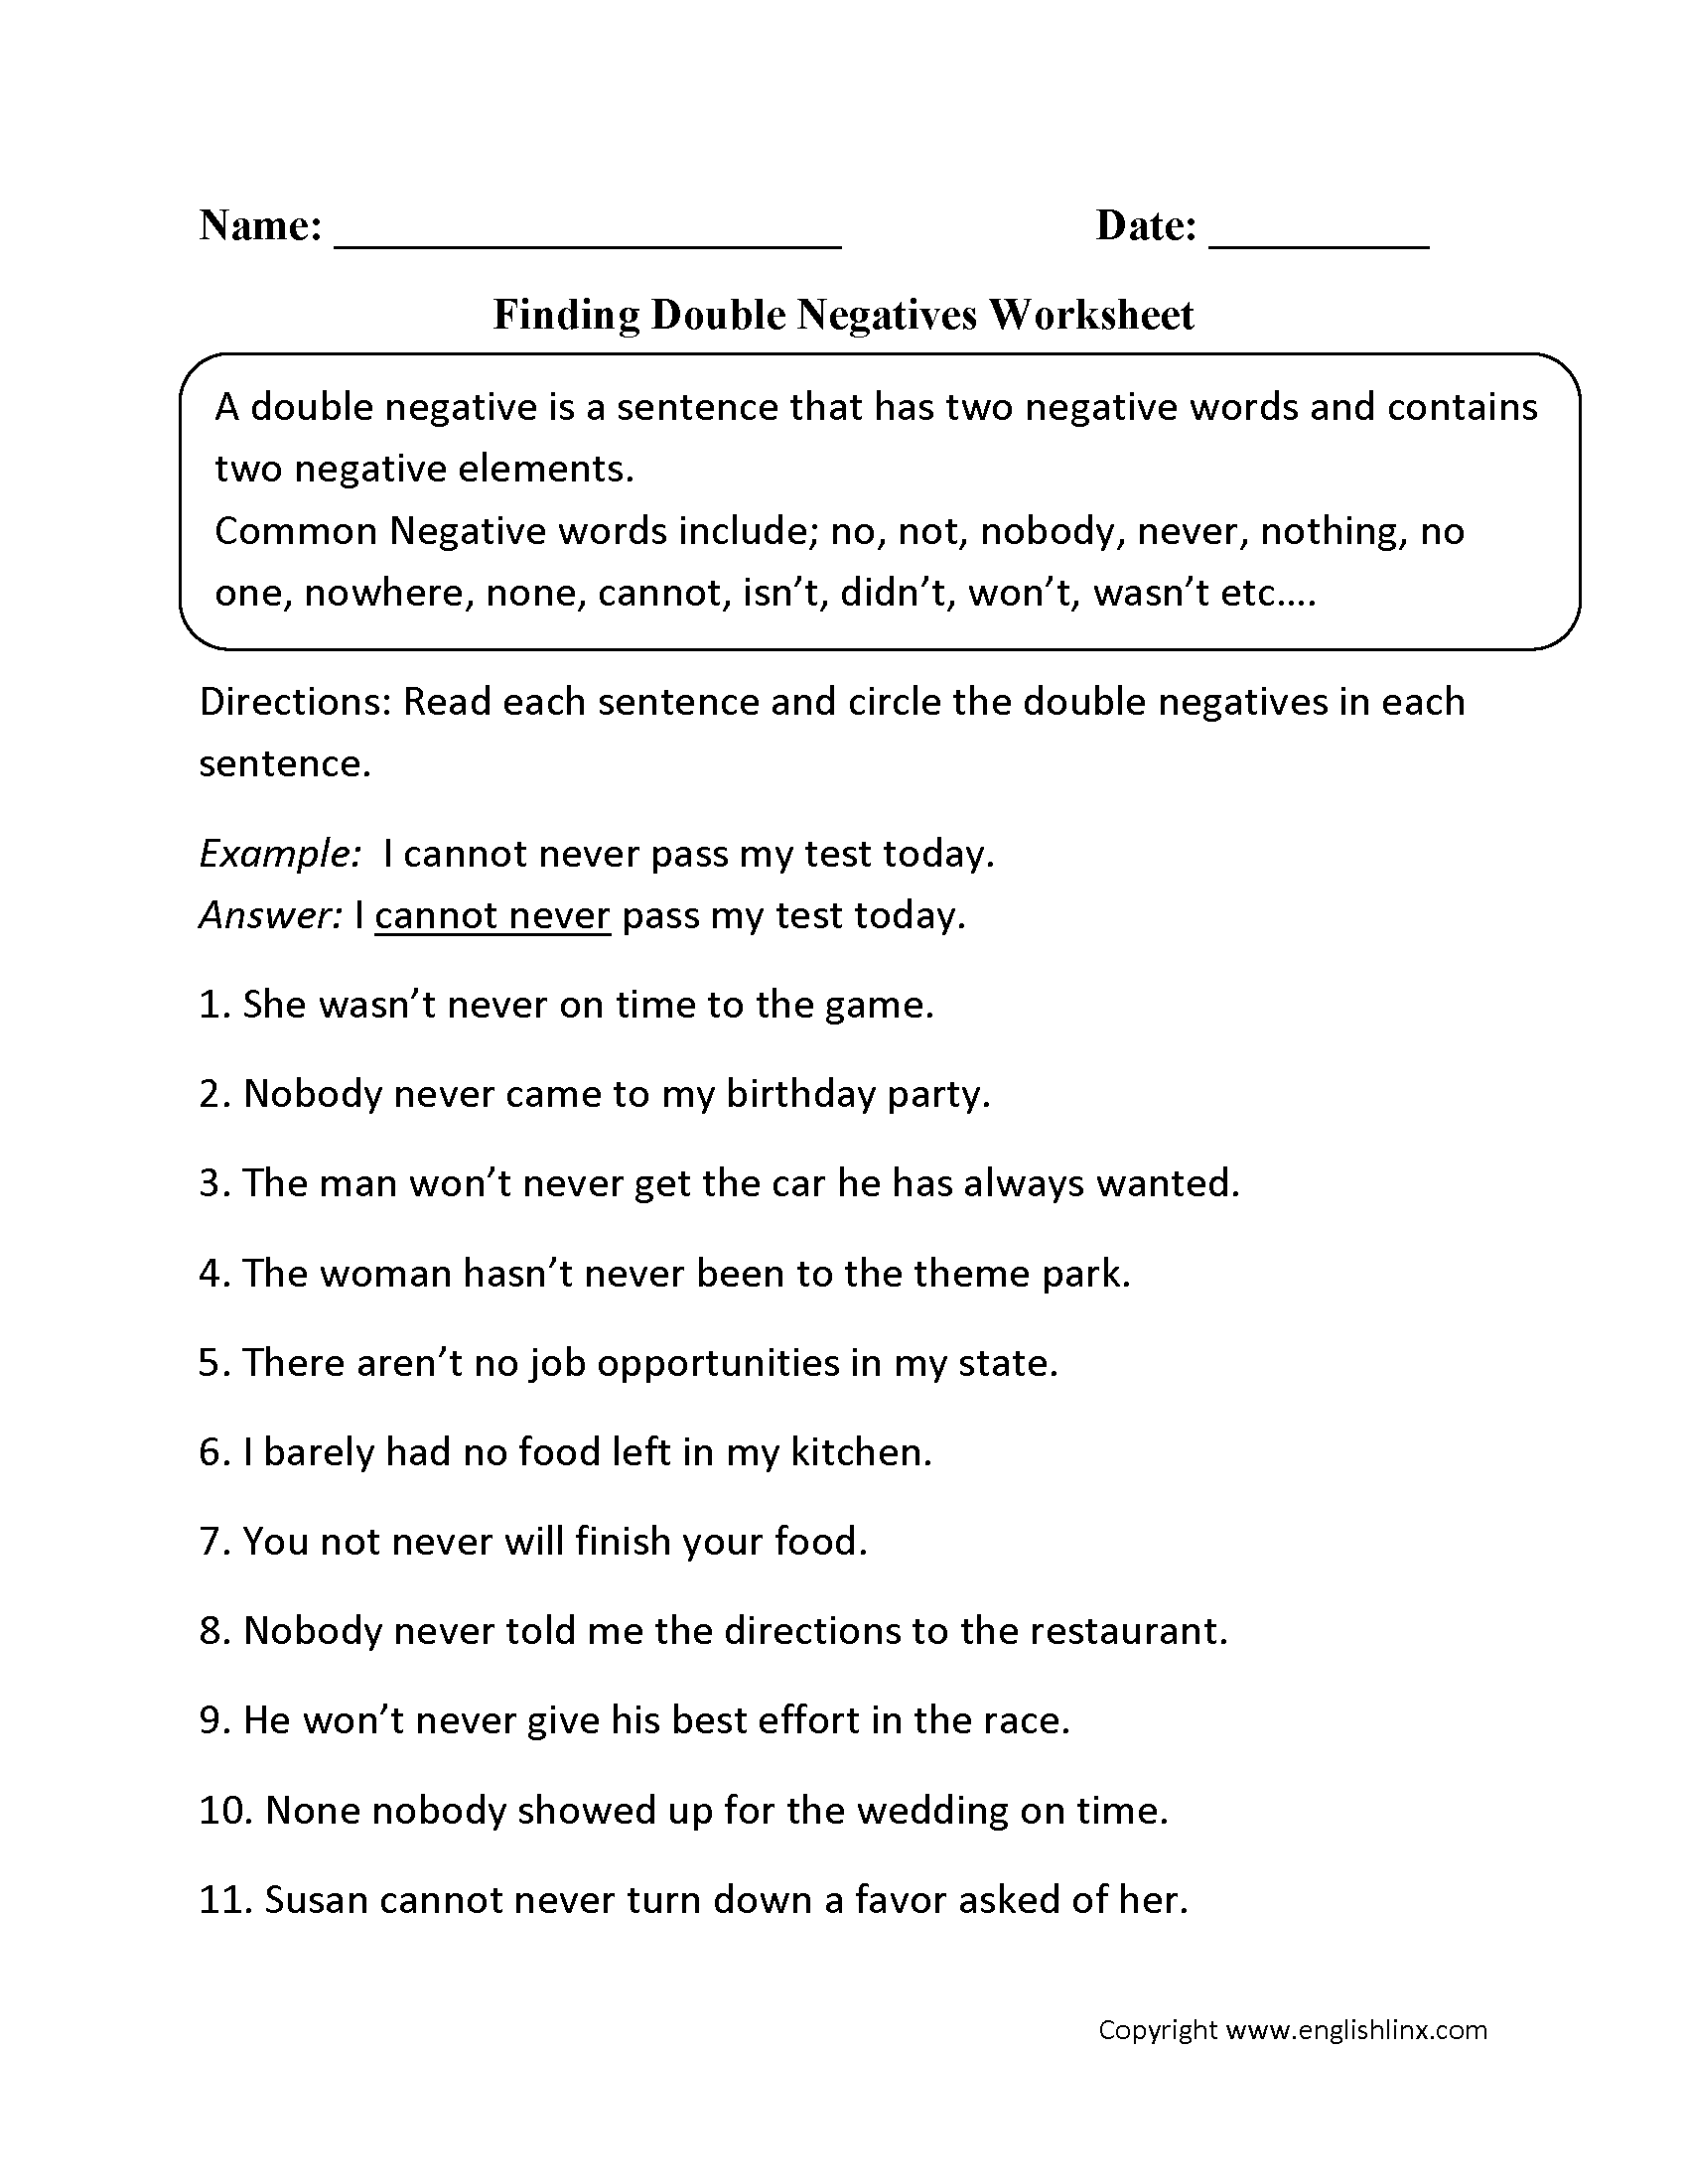 Finding Double Negatives Worksheet Word Usage Negativity Double Negative [ 2200 x 1700 Pixel ]